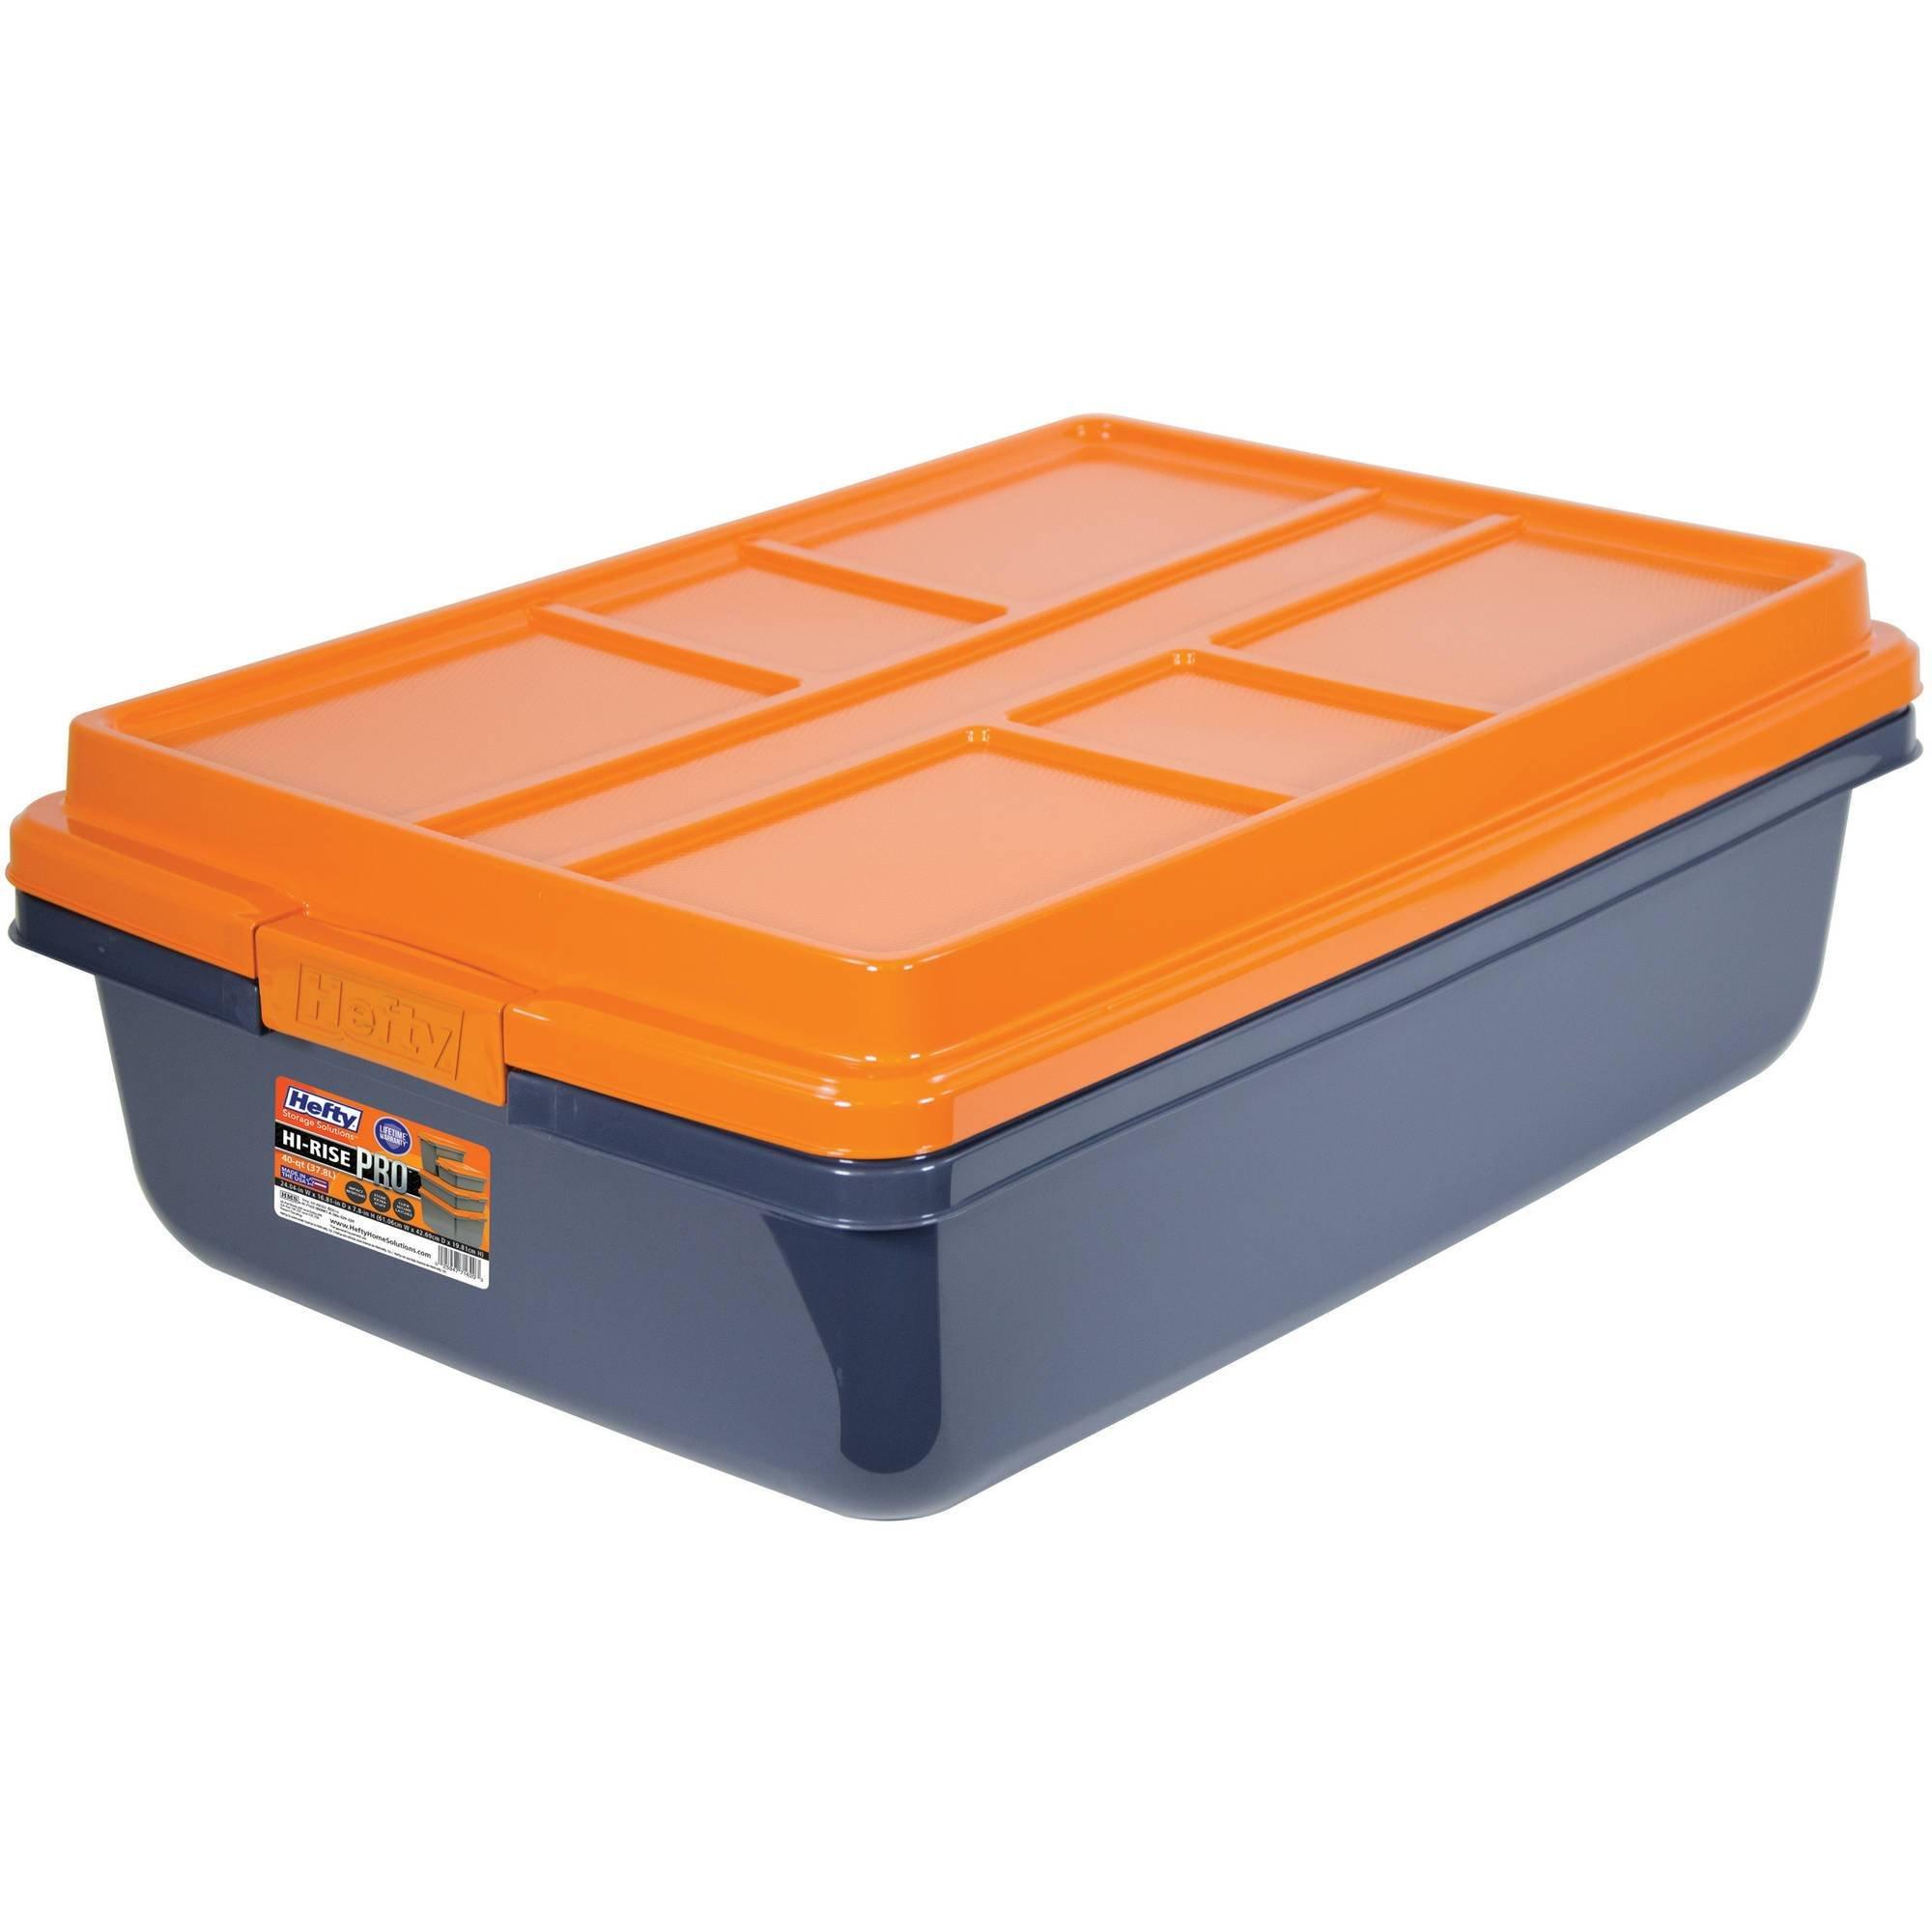 I Love Kay Hefty HI-RISE PRO Heavy Duty Storage Bins, 40 Qt. Latch Storage Box, Orange/Gray